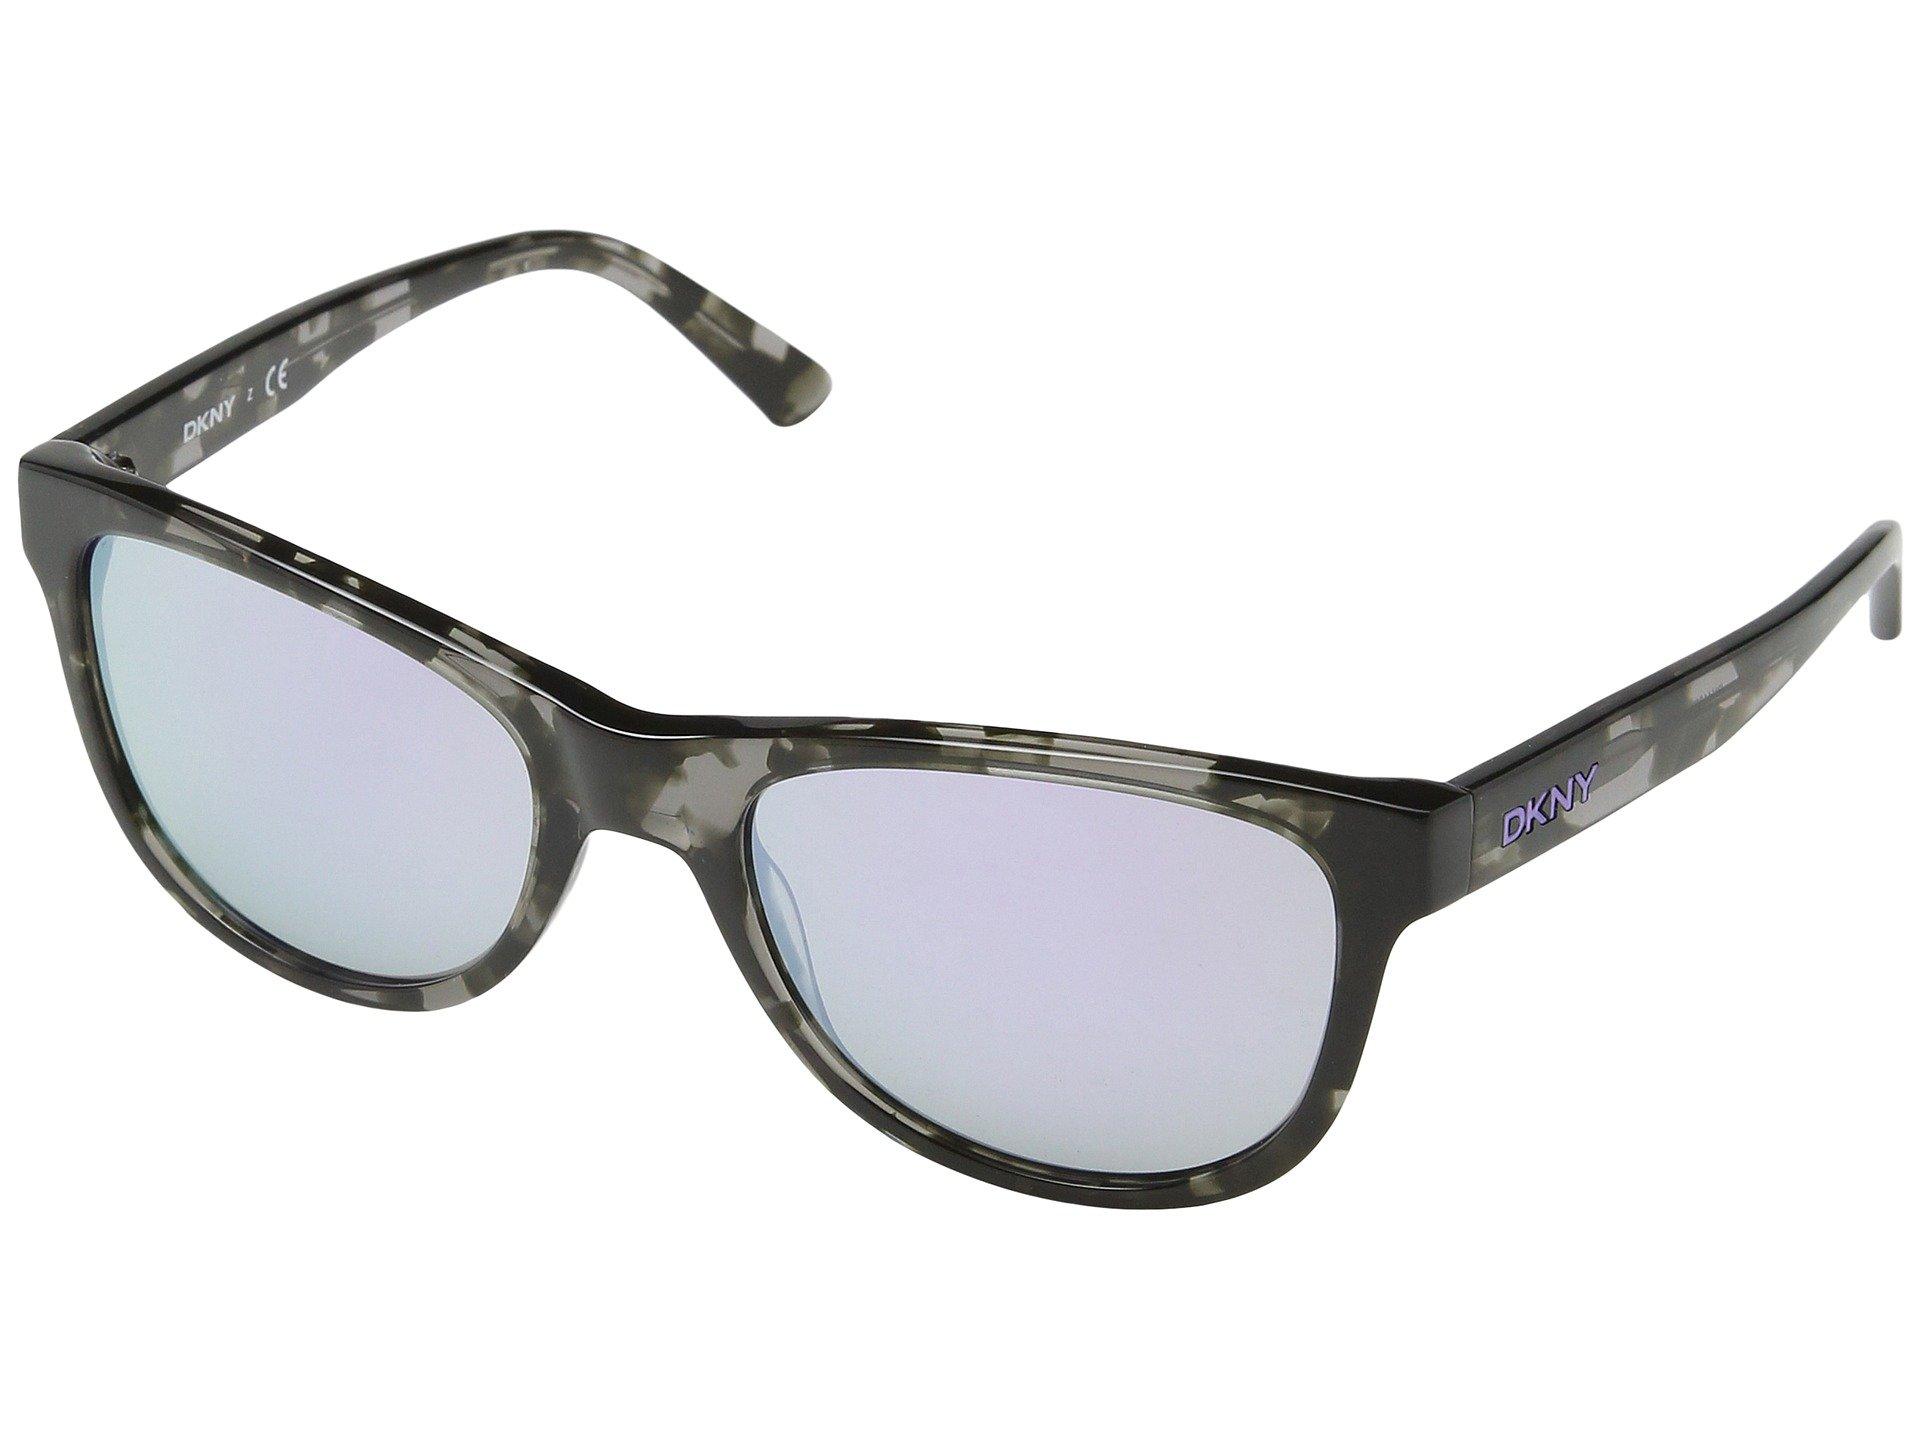 Gafas para Mujer DKNY 0DY4139  + DKNY en VeoyCompro.net